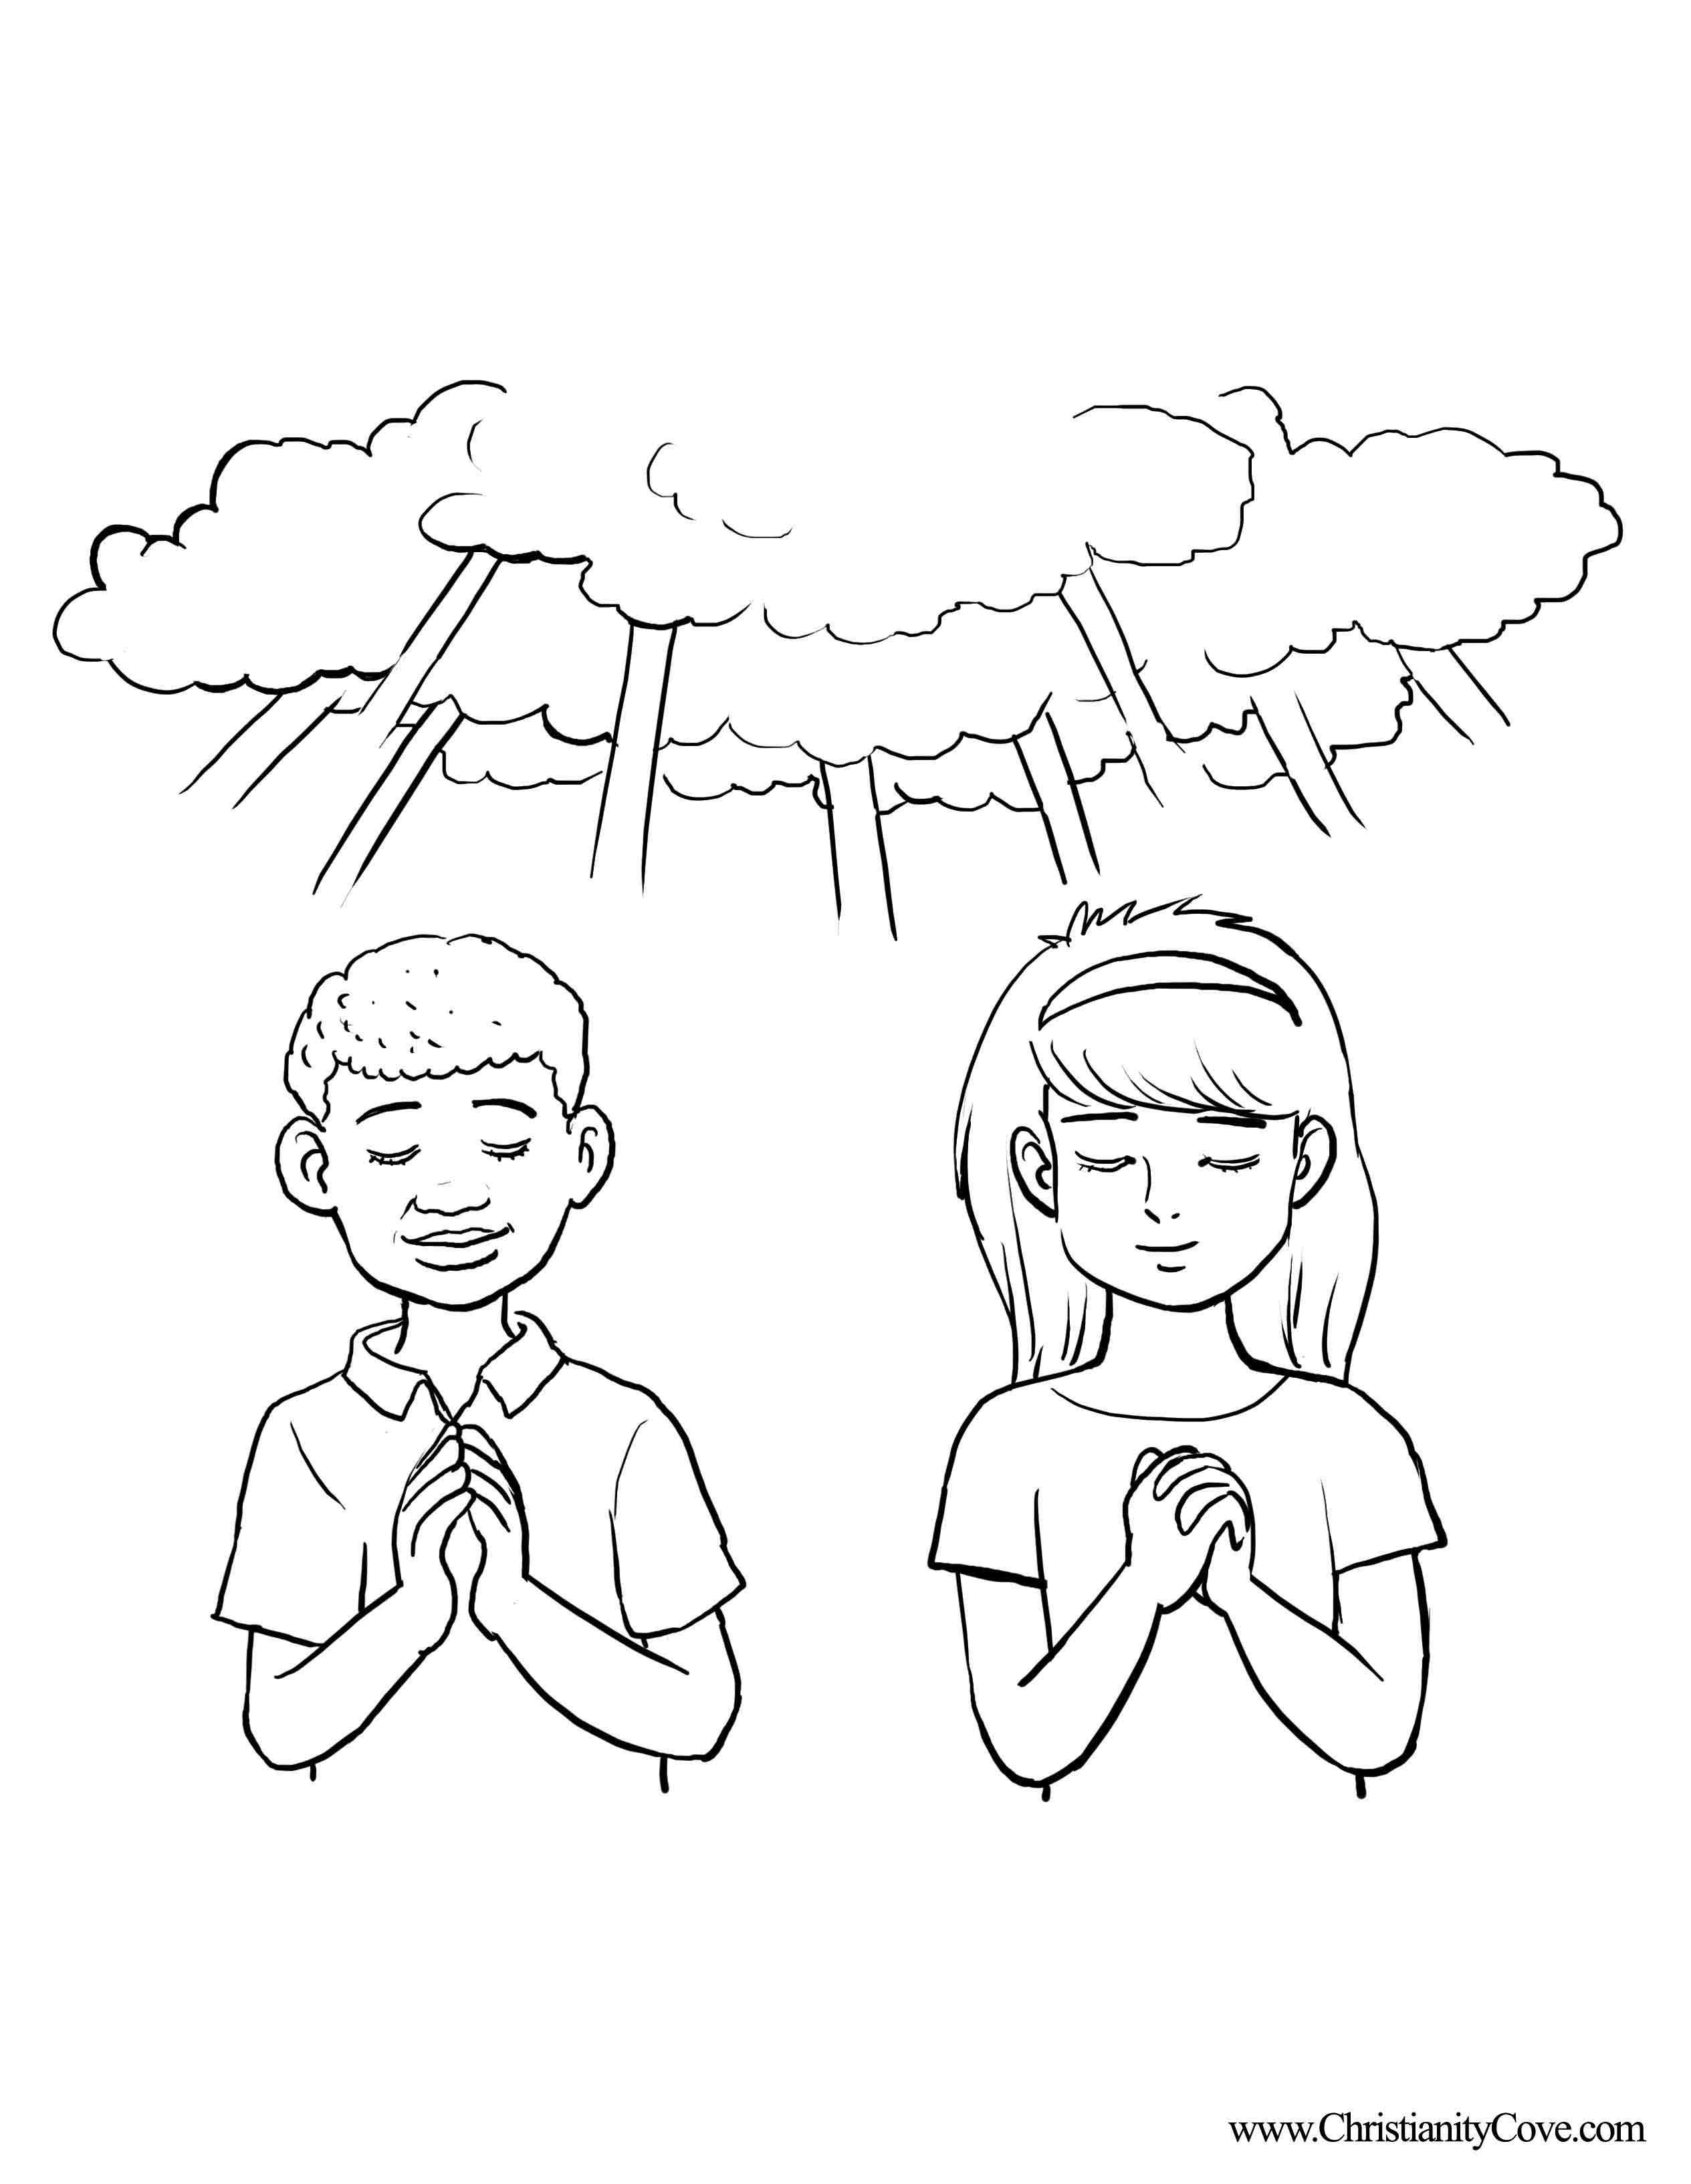 2529x3267 Prayer Coloring Pages For Kids Printable Tiny Draw Printable